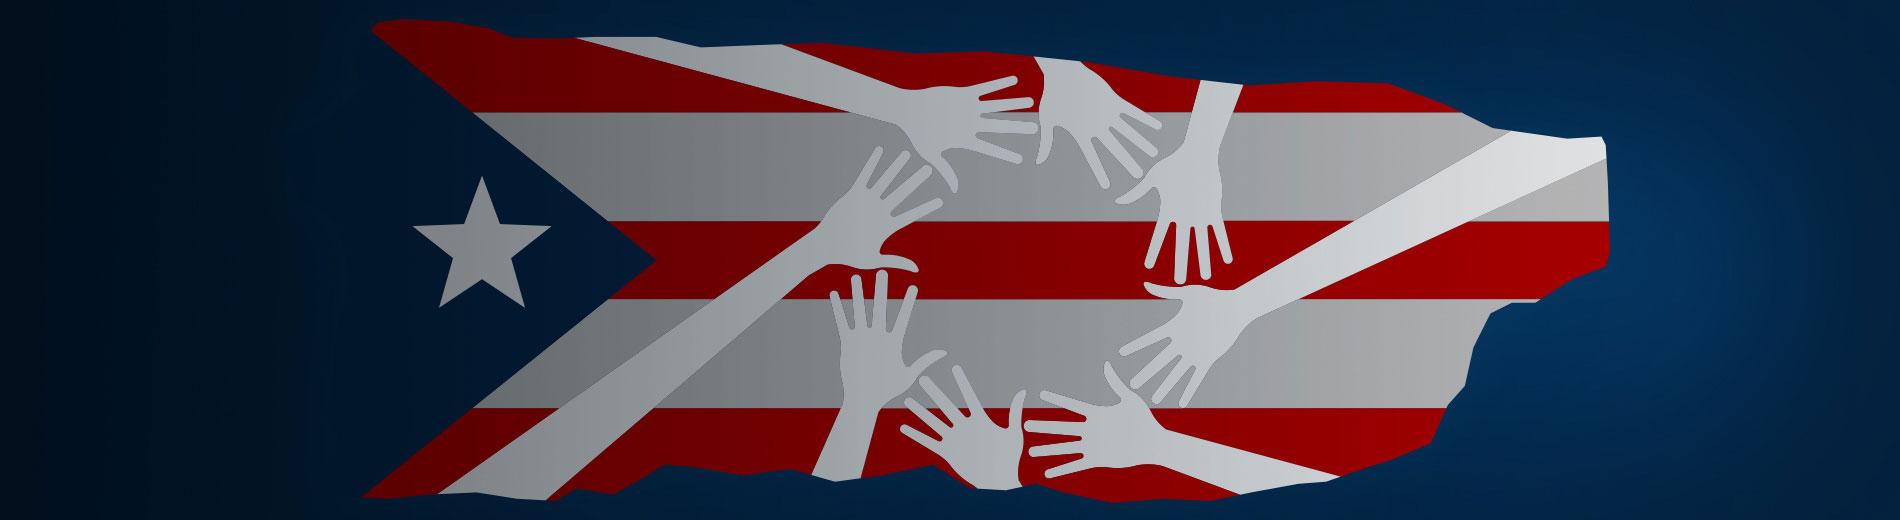 illustration of Puerto Rican flag